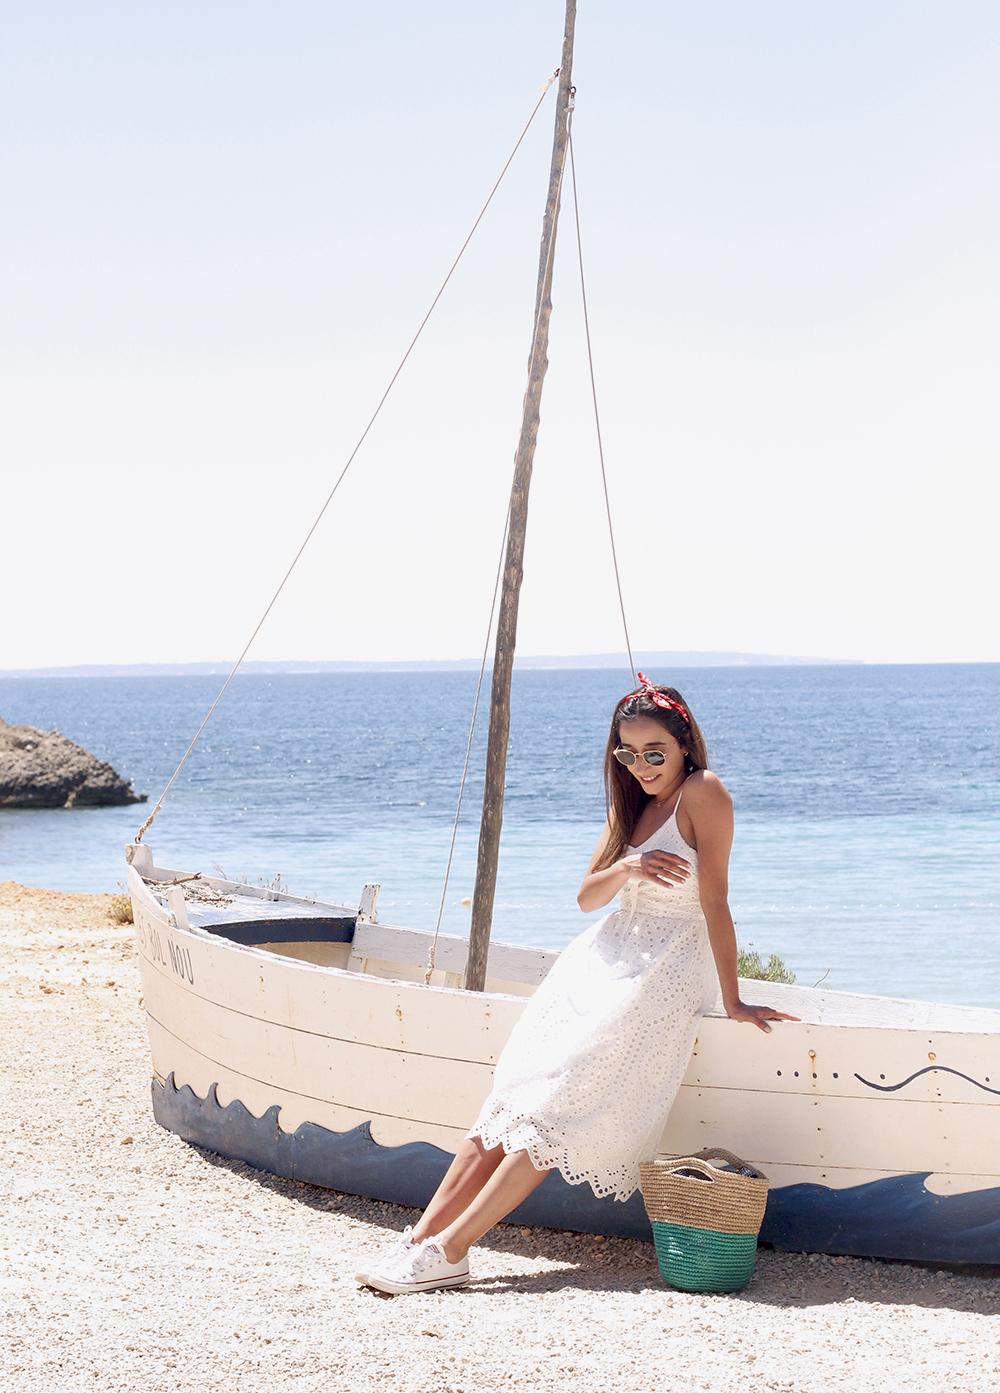 white summer dress white converse rayban sunglasses 2019 street style outfit vacation ibiza9